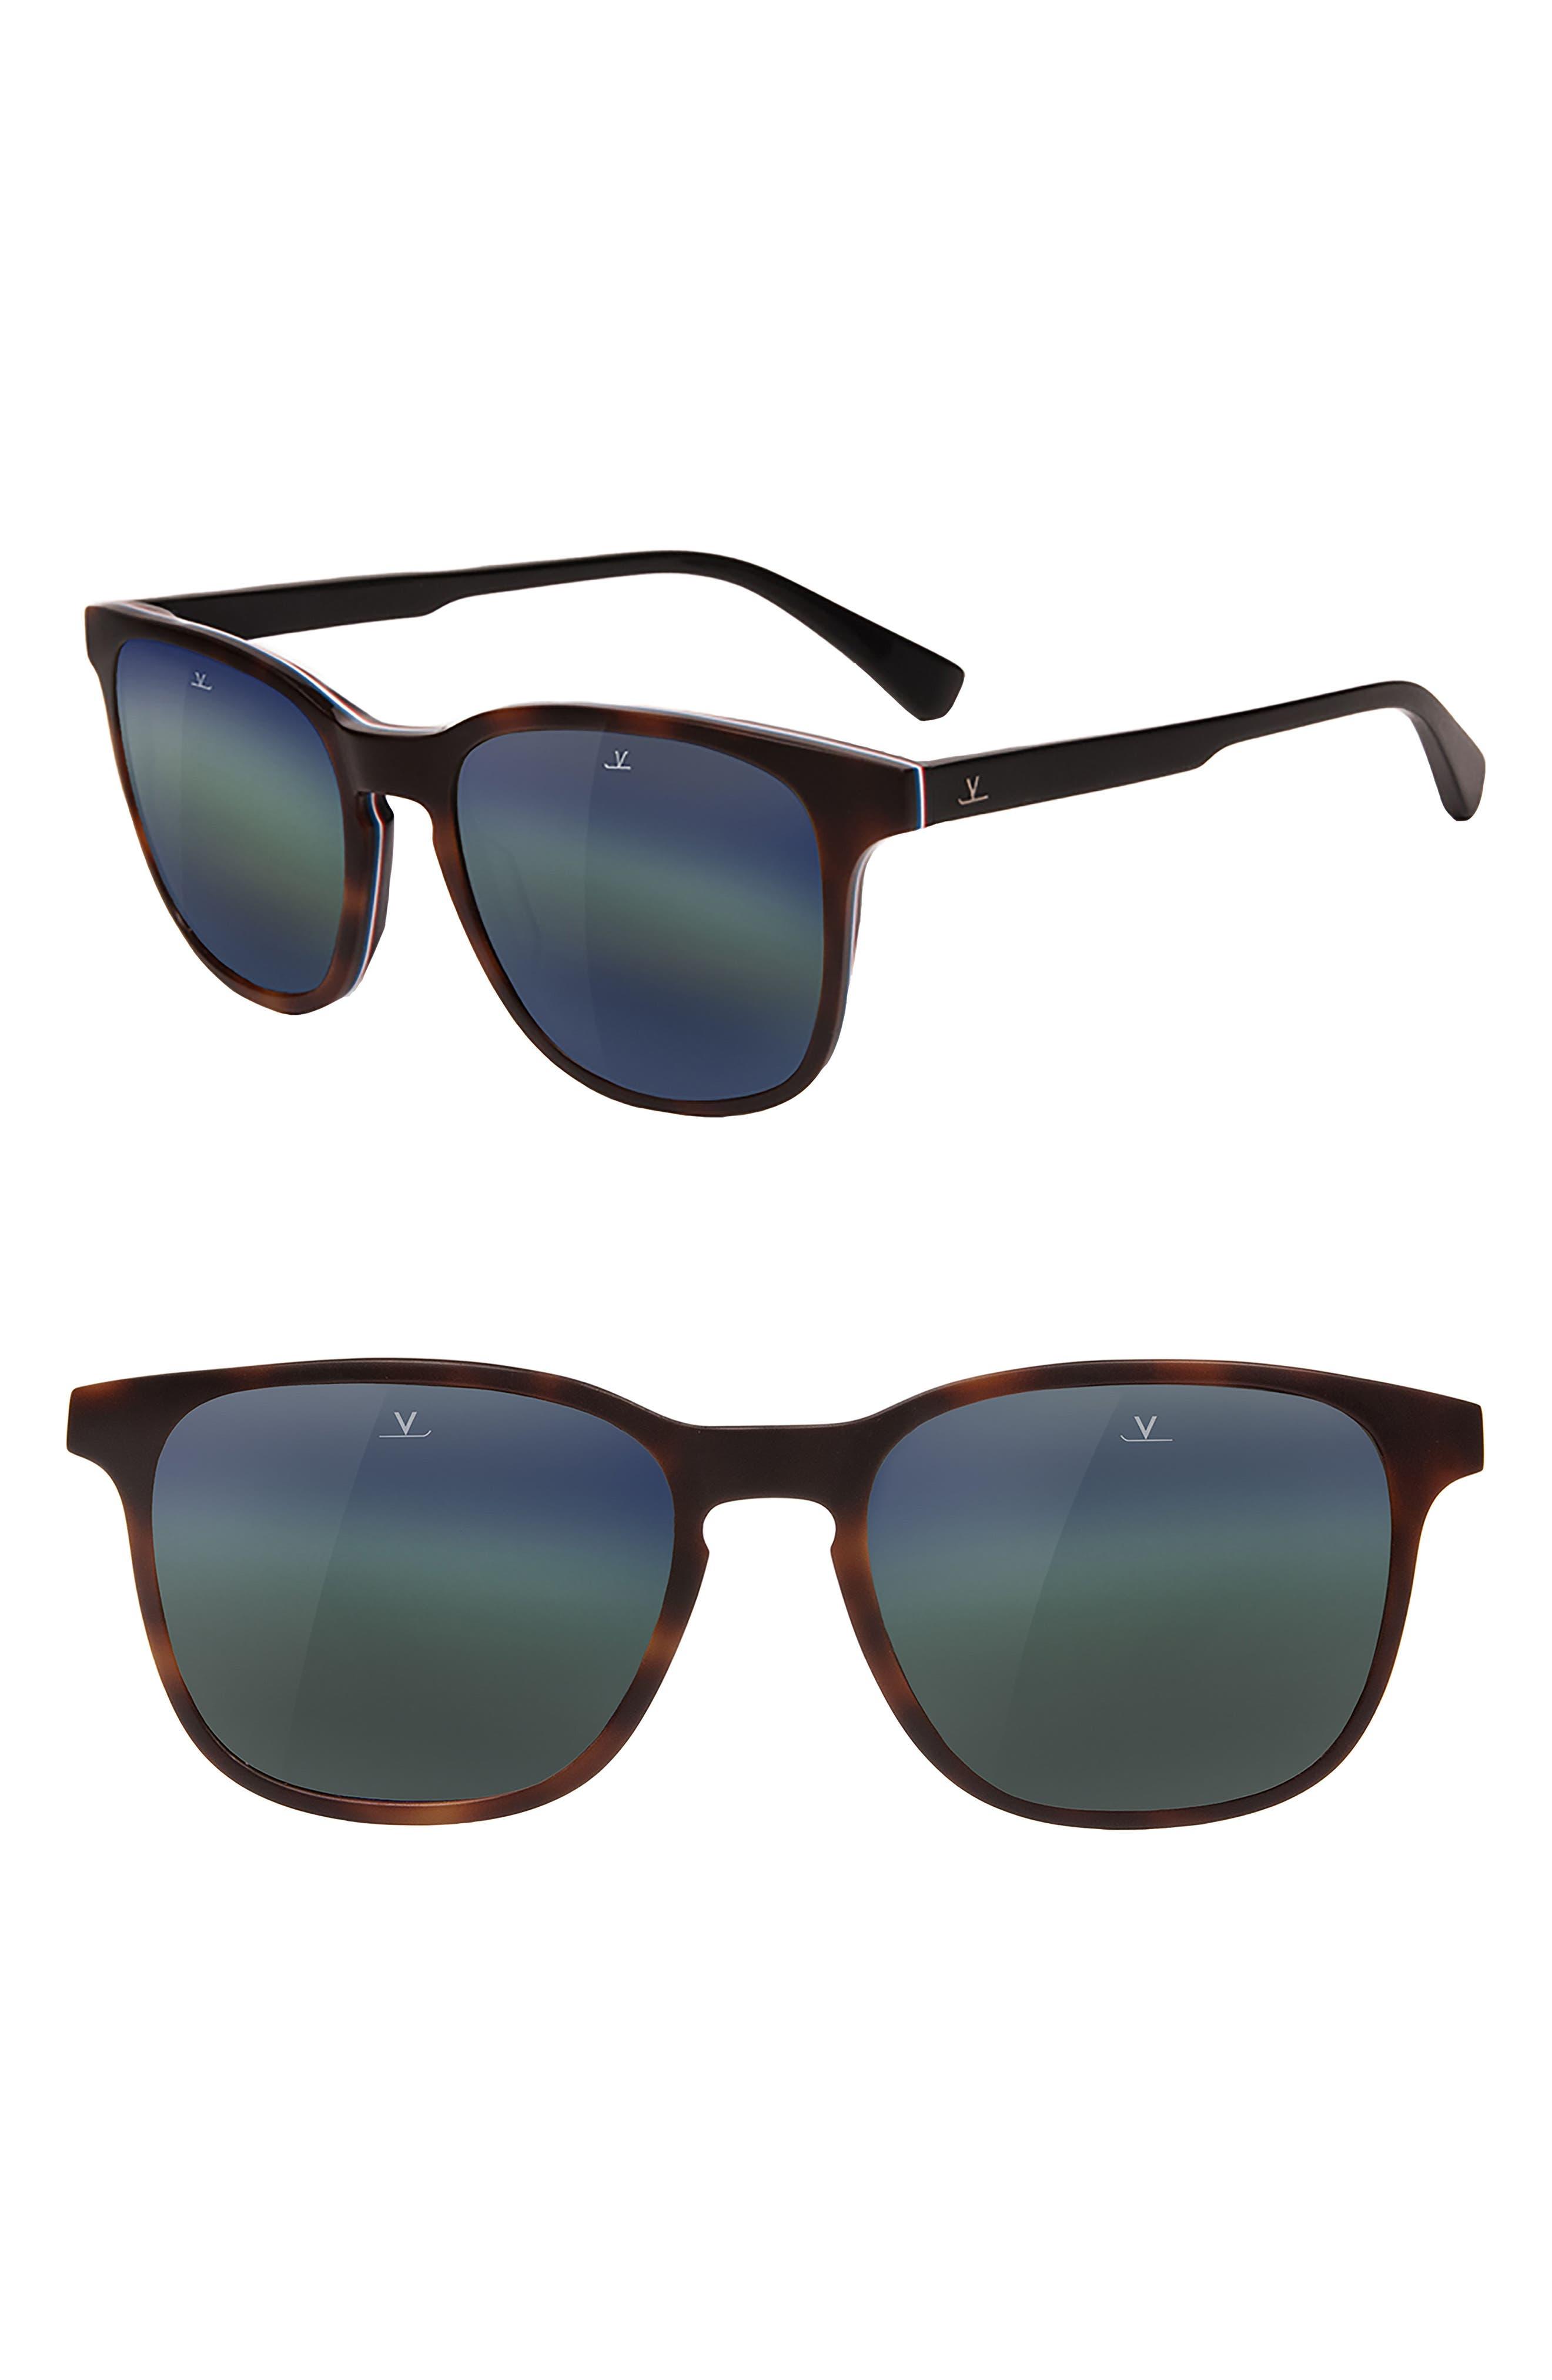 District Medium 53mm Sunglasses,                             Main thumbnail 1, color,                             203